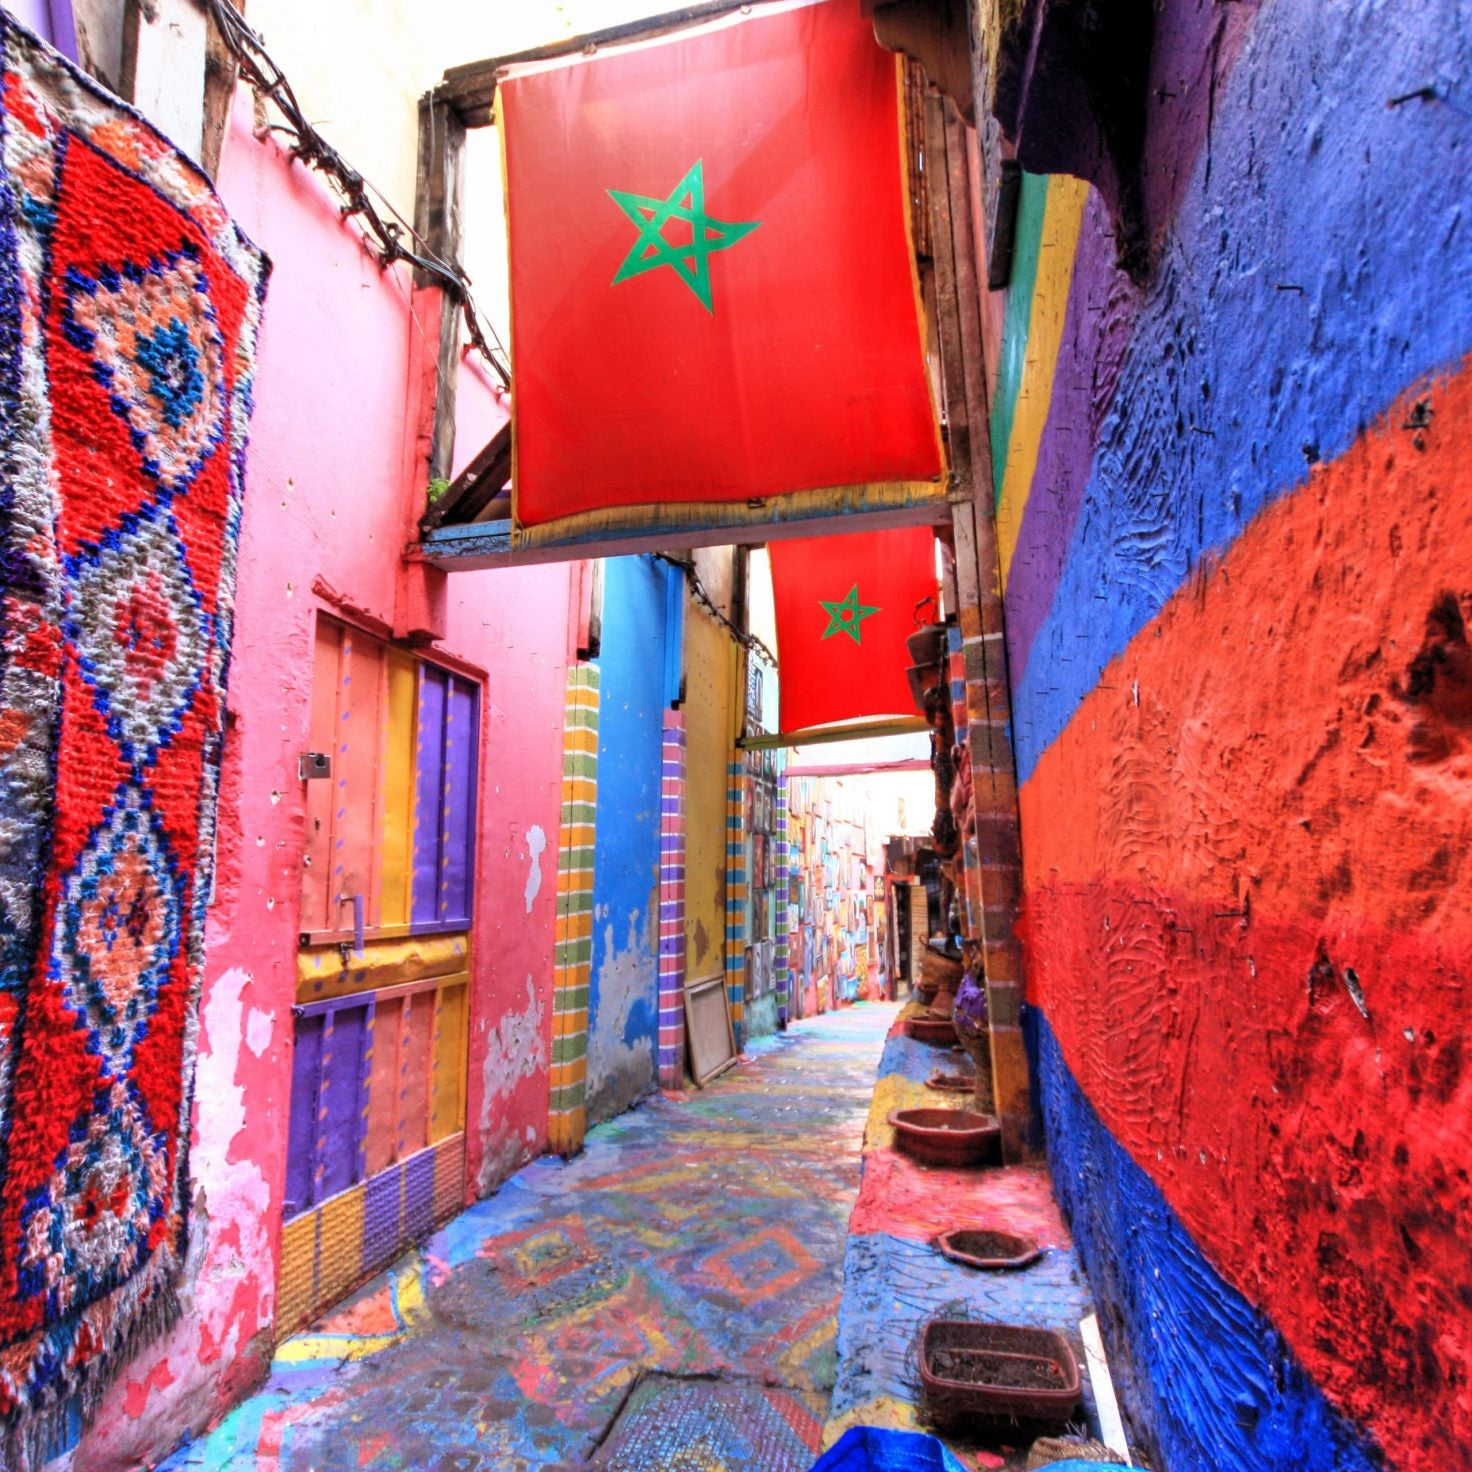 Destination Spotlight: Get Lost in the Magic of Marrakech